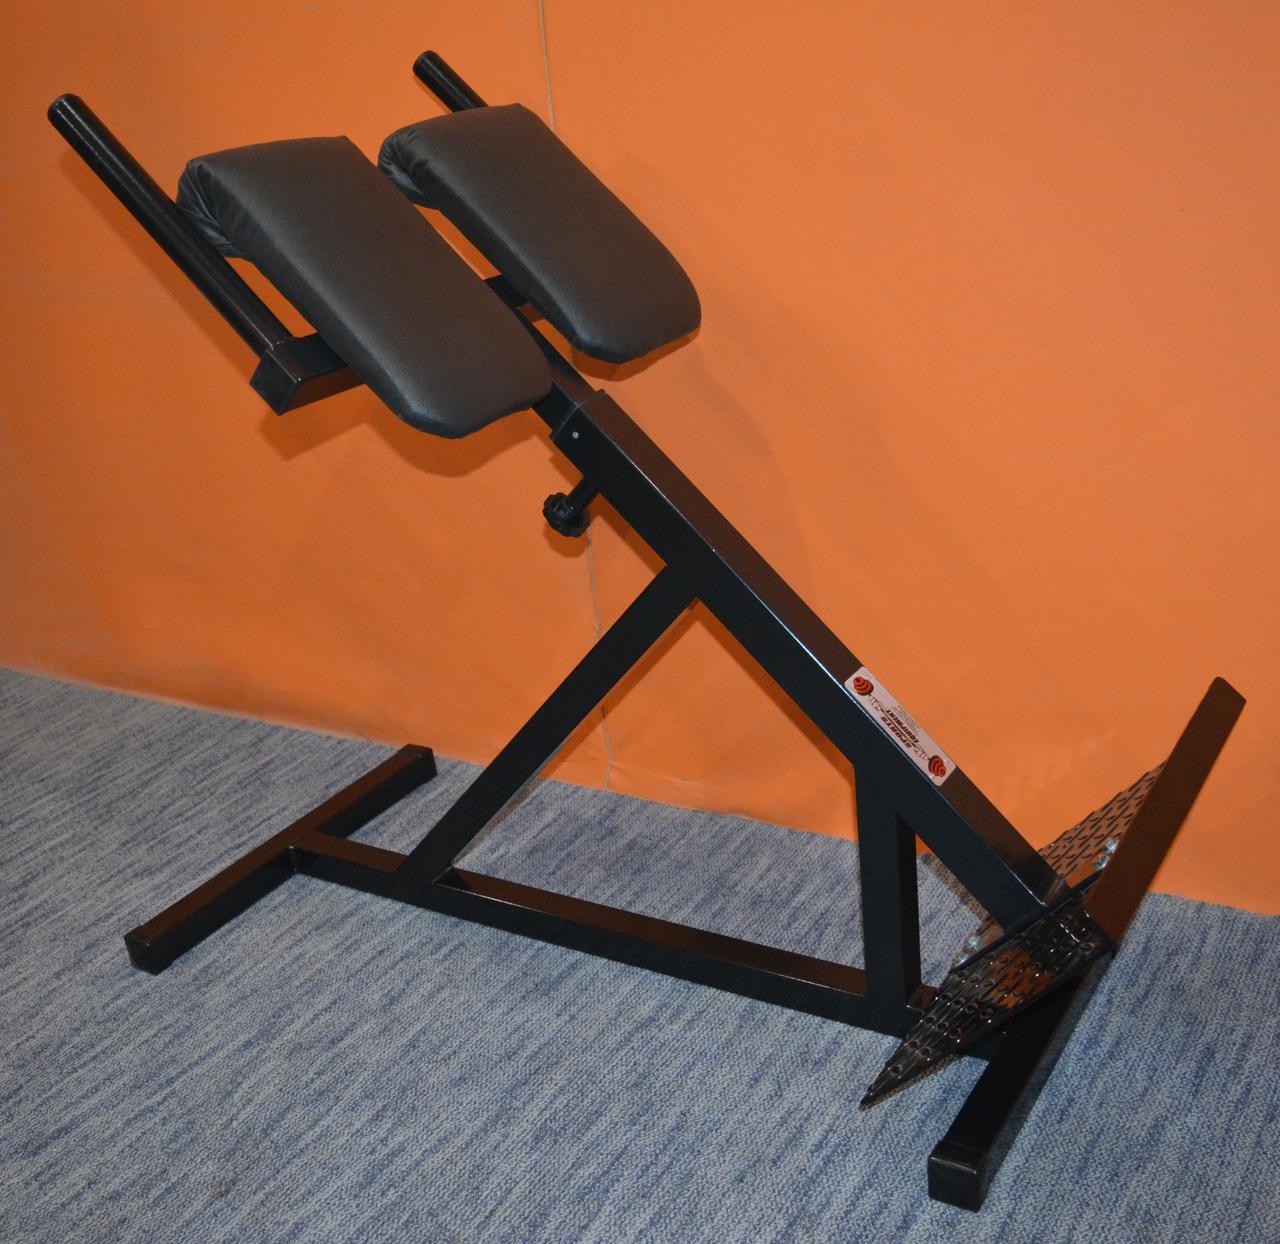 Тренажер гиперэкстензия для дома регулируемая, римский стул MALCHENKO 45°